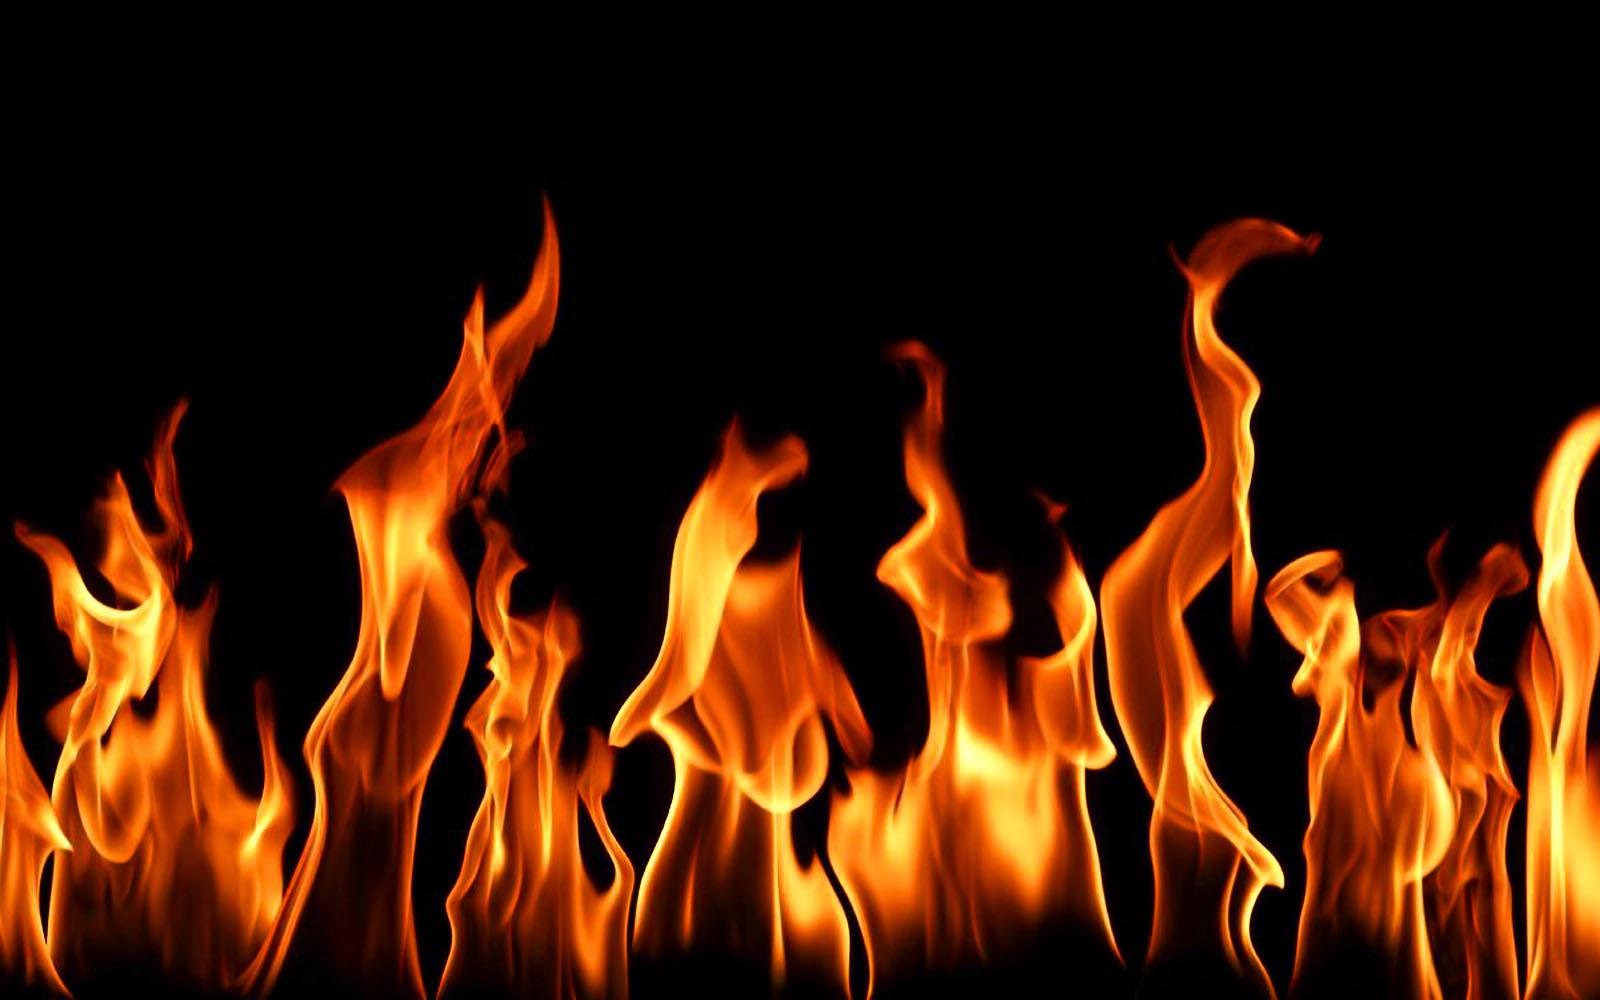 Fire Wallpaper Pc: Fire Desktop Wallpapers